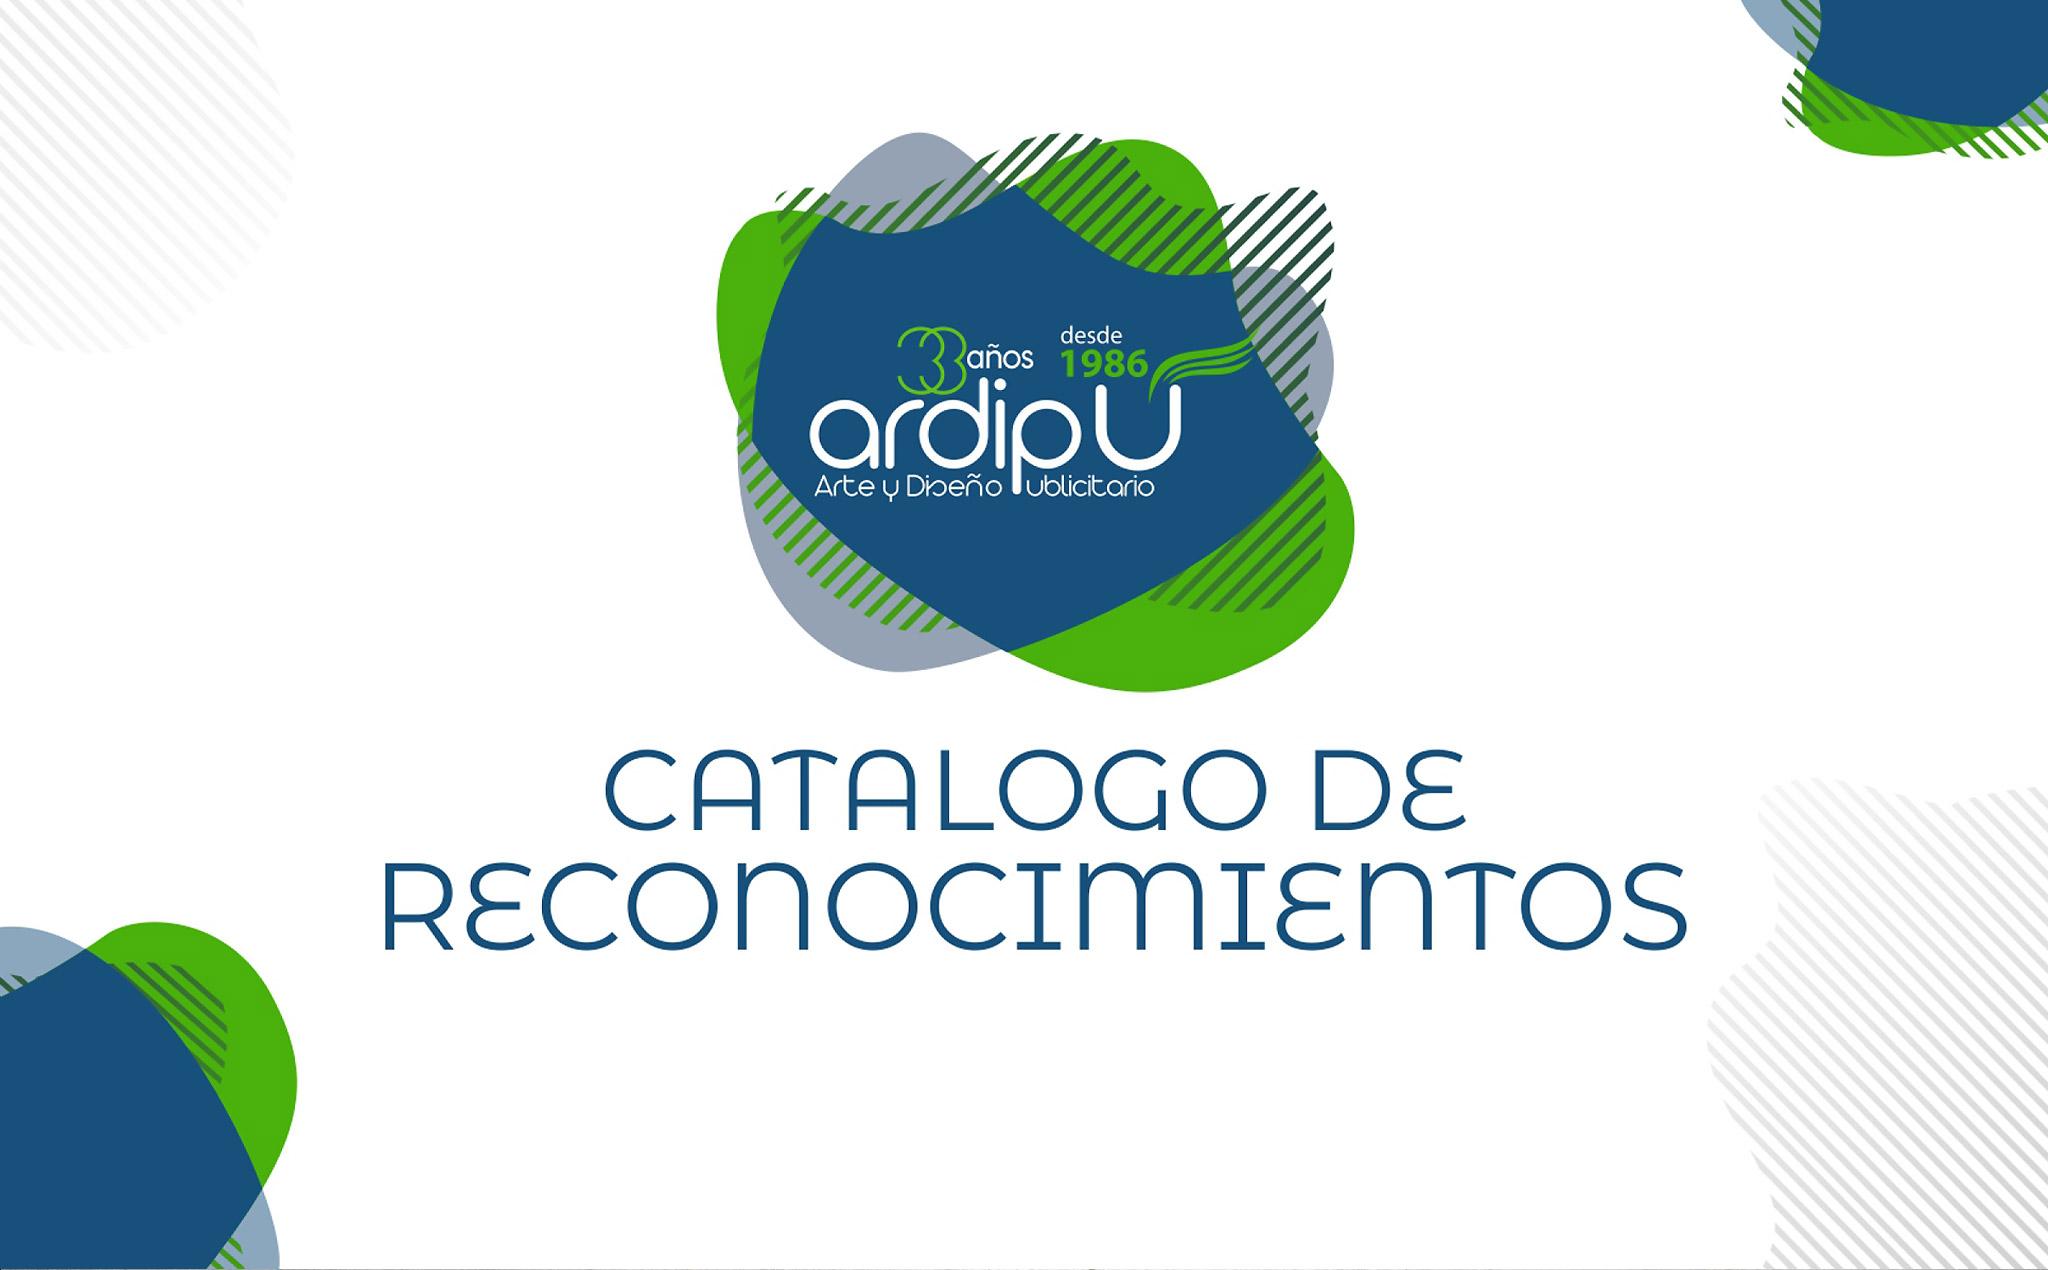 https://ardipu.com/wp-content/uploads/2019/07/reconocimientos-1.jpg